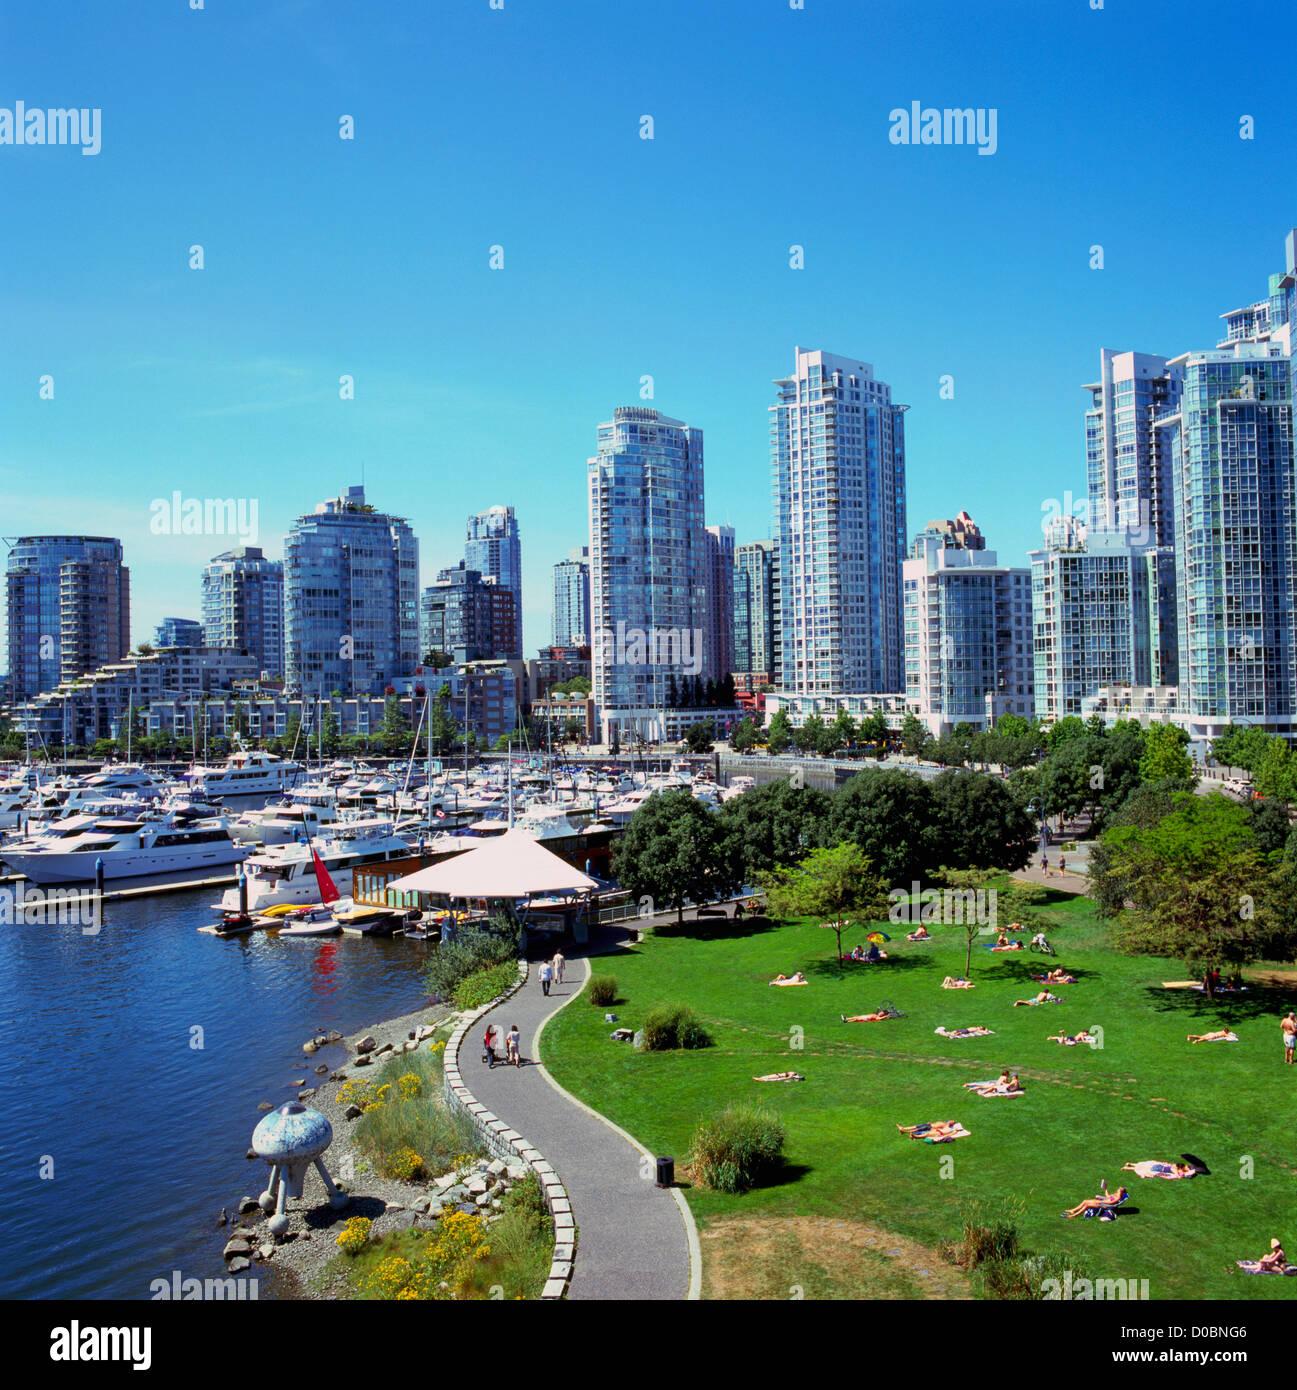 Vancouver Bc Canada: Yaletown, Vancouver, BC, British Columbia, Canada